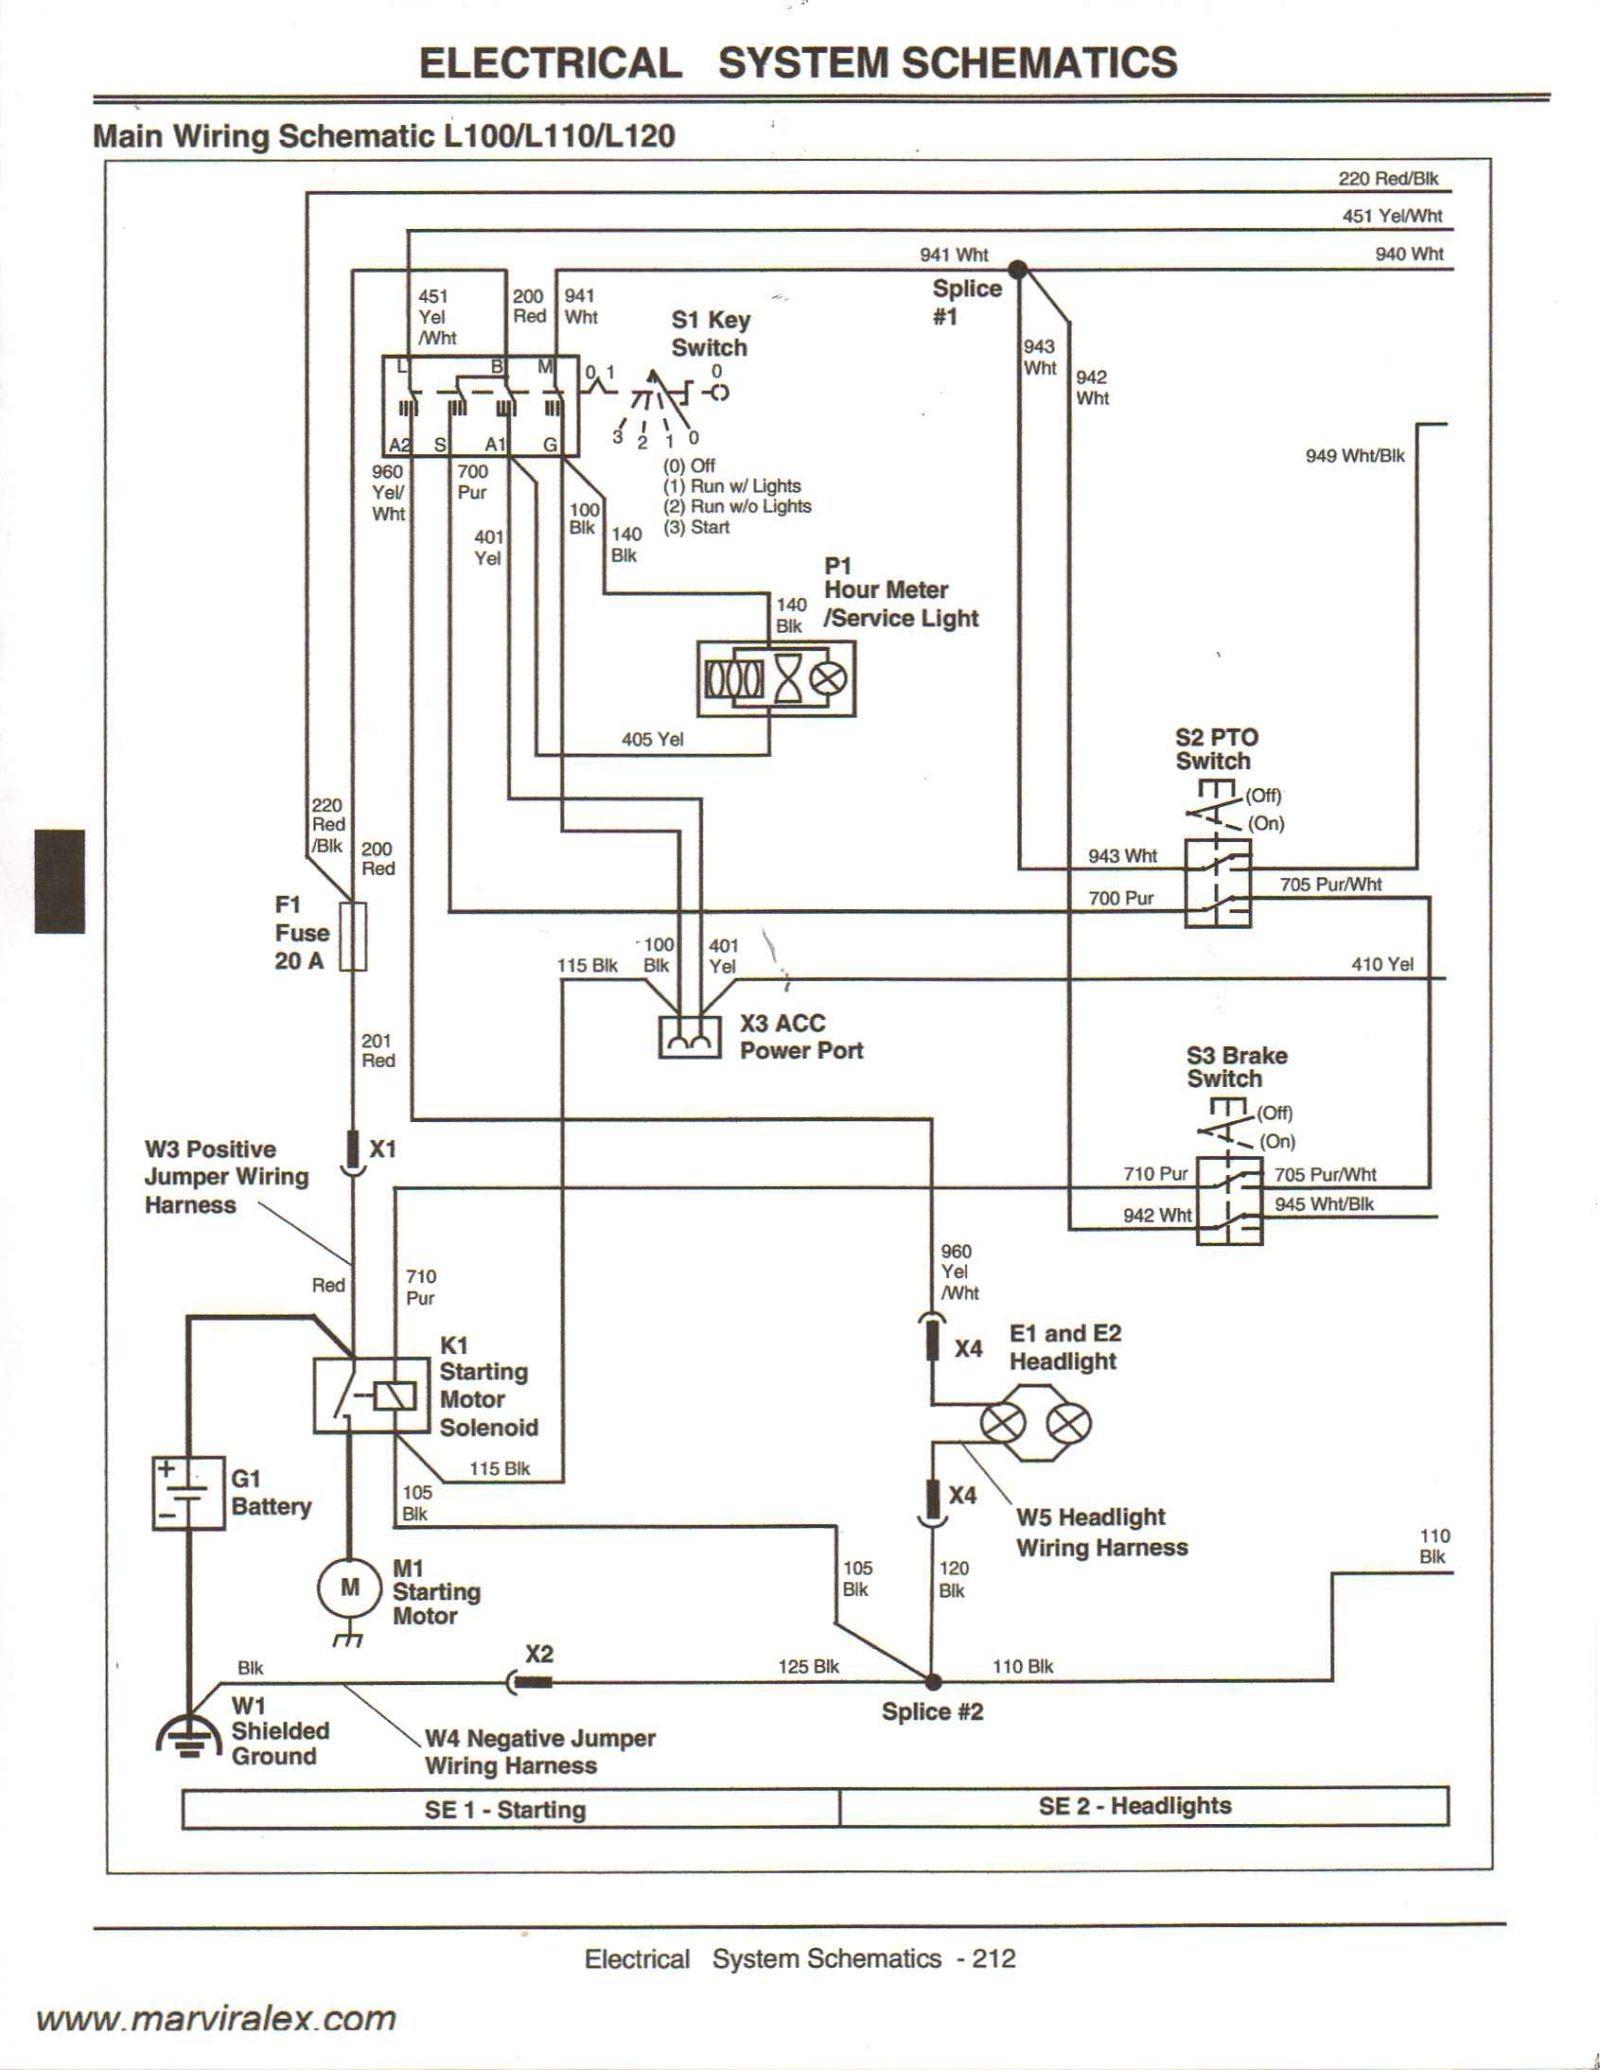 John Deere 345 Lawn Tractor Wiring Diagram Diagram] John Deere 120 Wiring Diagram Full Version Hd Of John Deere 345 Lawn Tractor Wiring Diagram